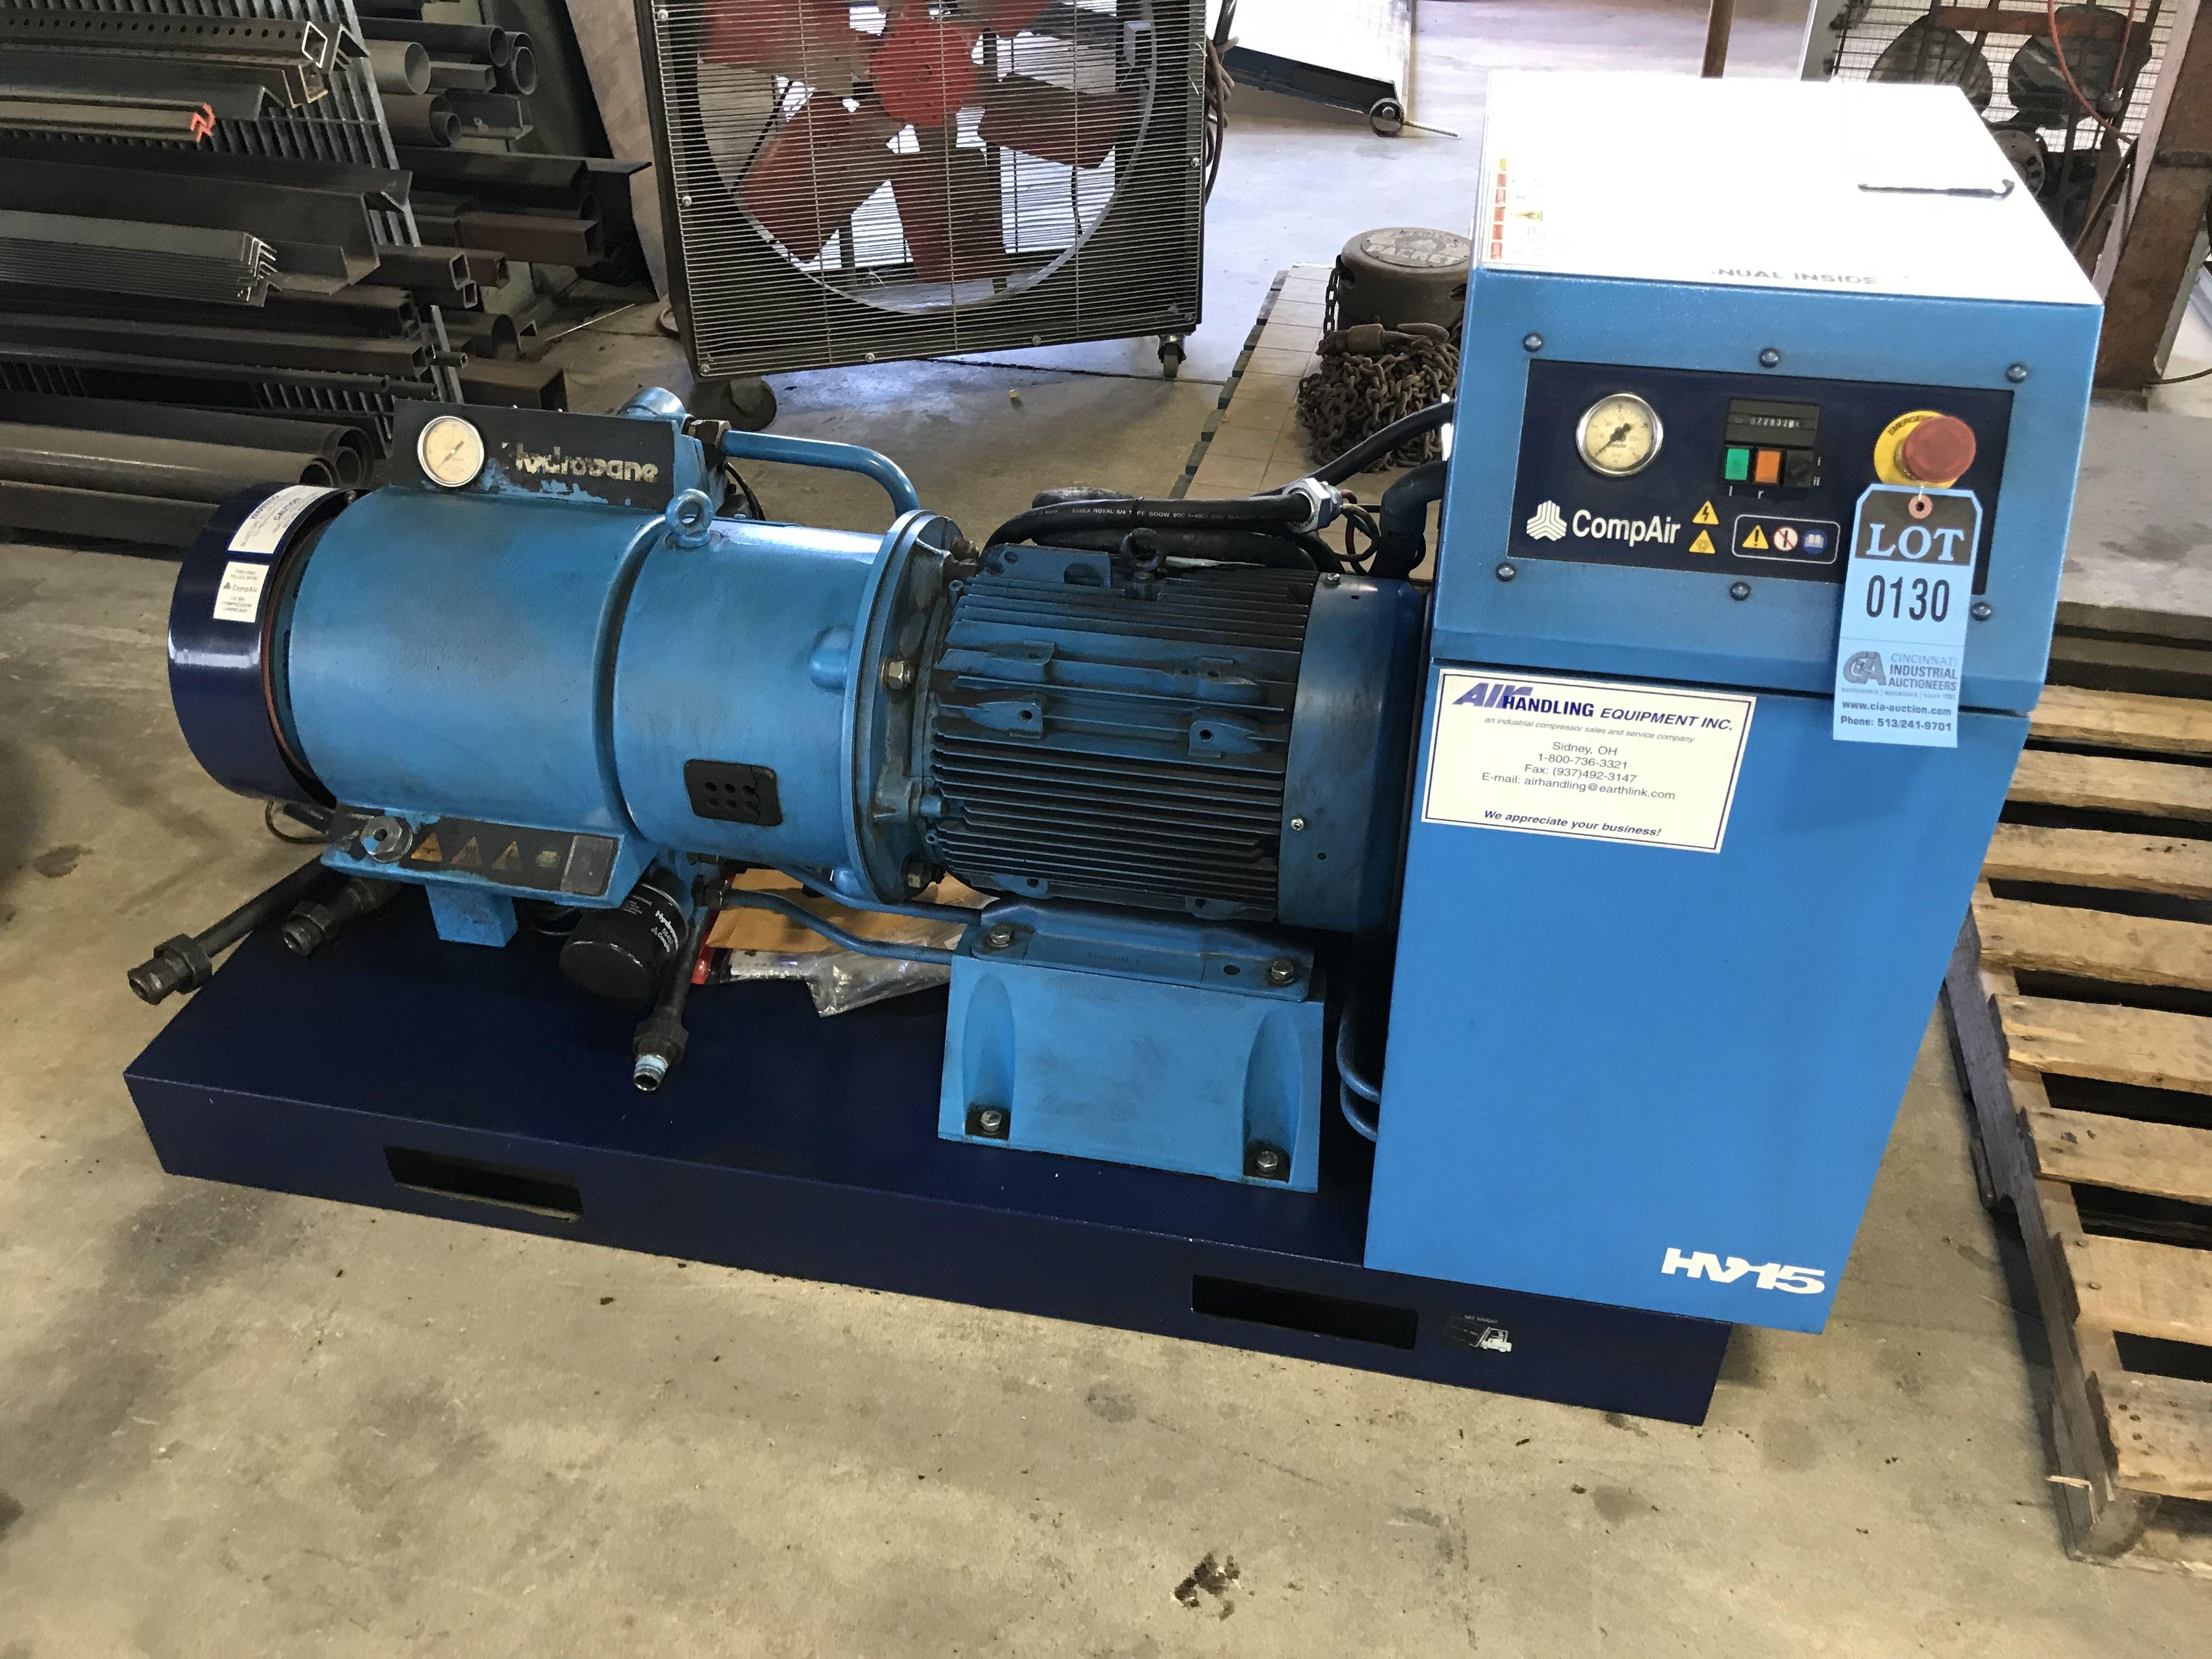 15 kw compair hydrovane model 715 psas08 skid mount rotary screw air rh  bidspotter com